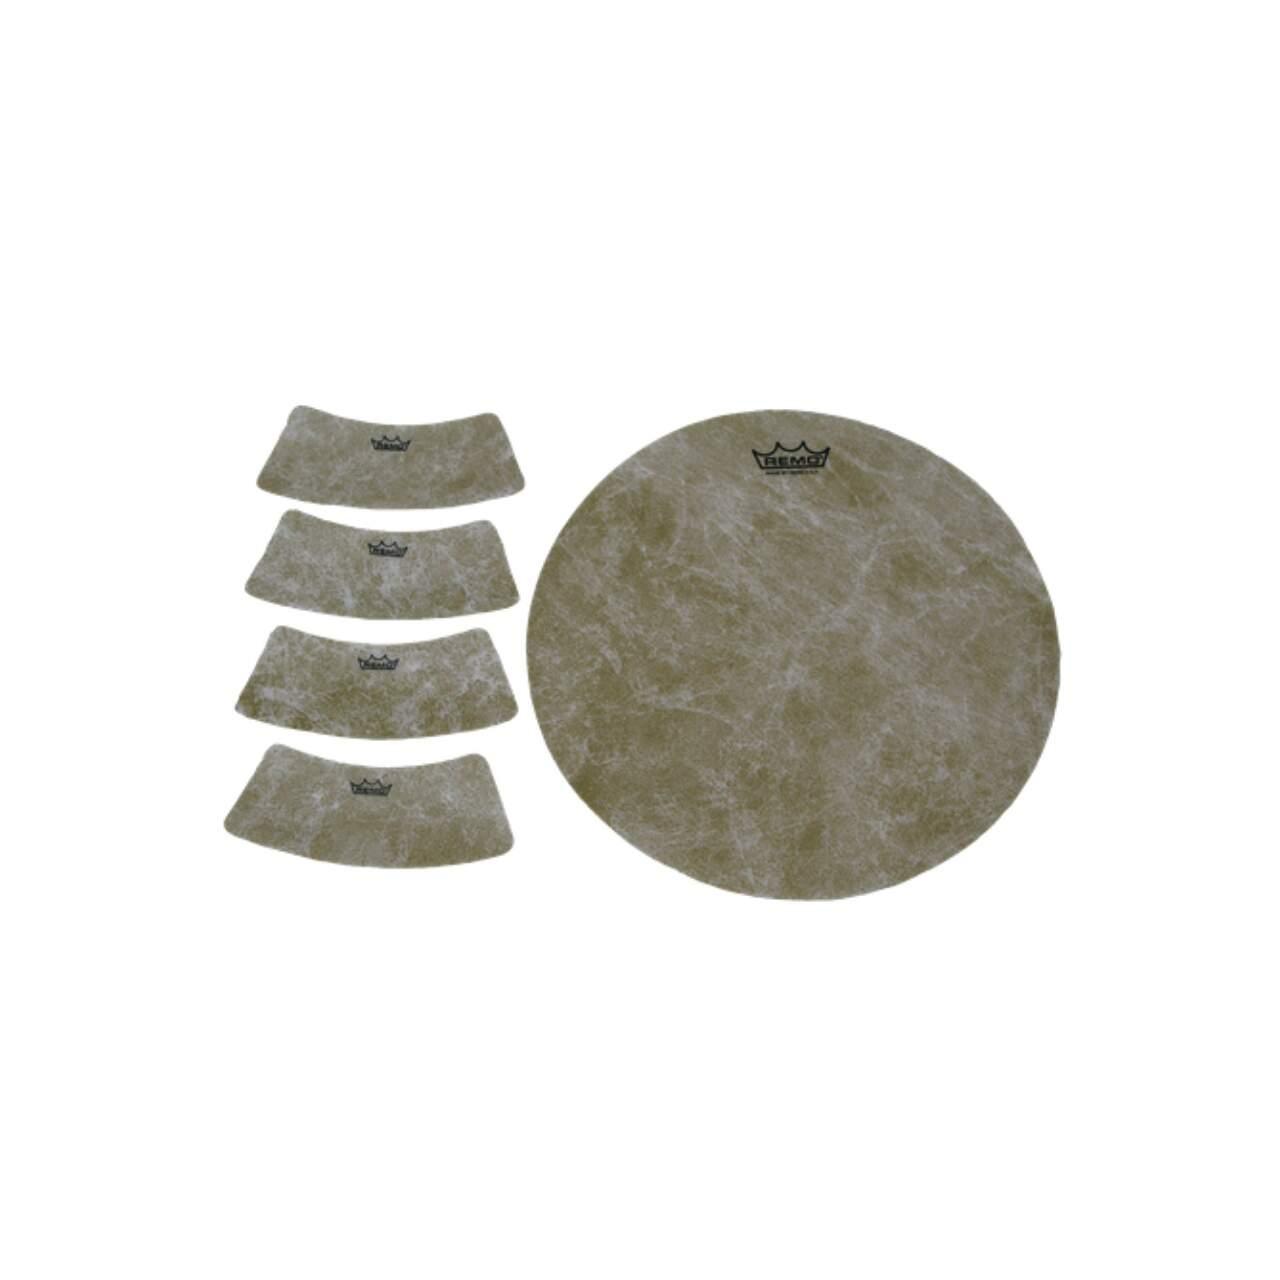 "Adesivo Texturizado Cajon 9,75"" Fiberskyn Texture Target"